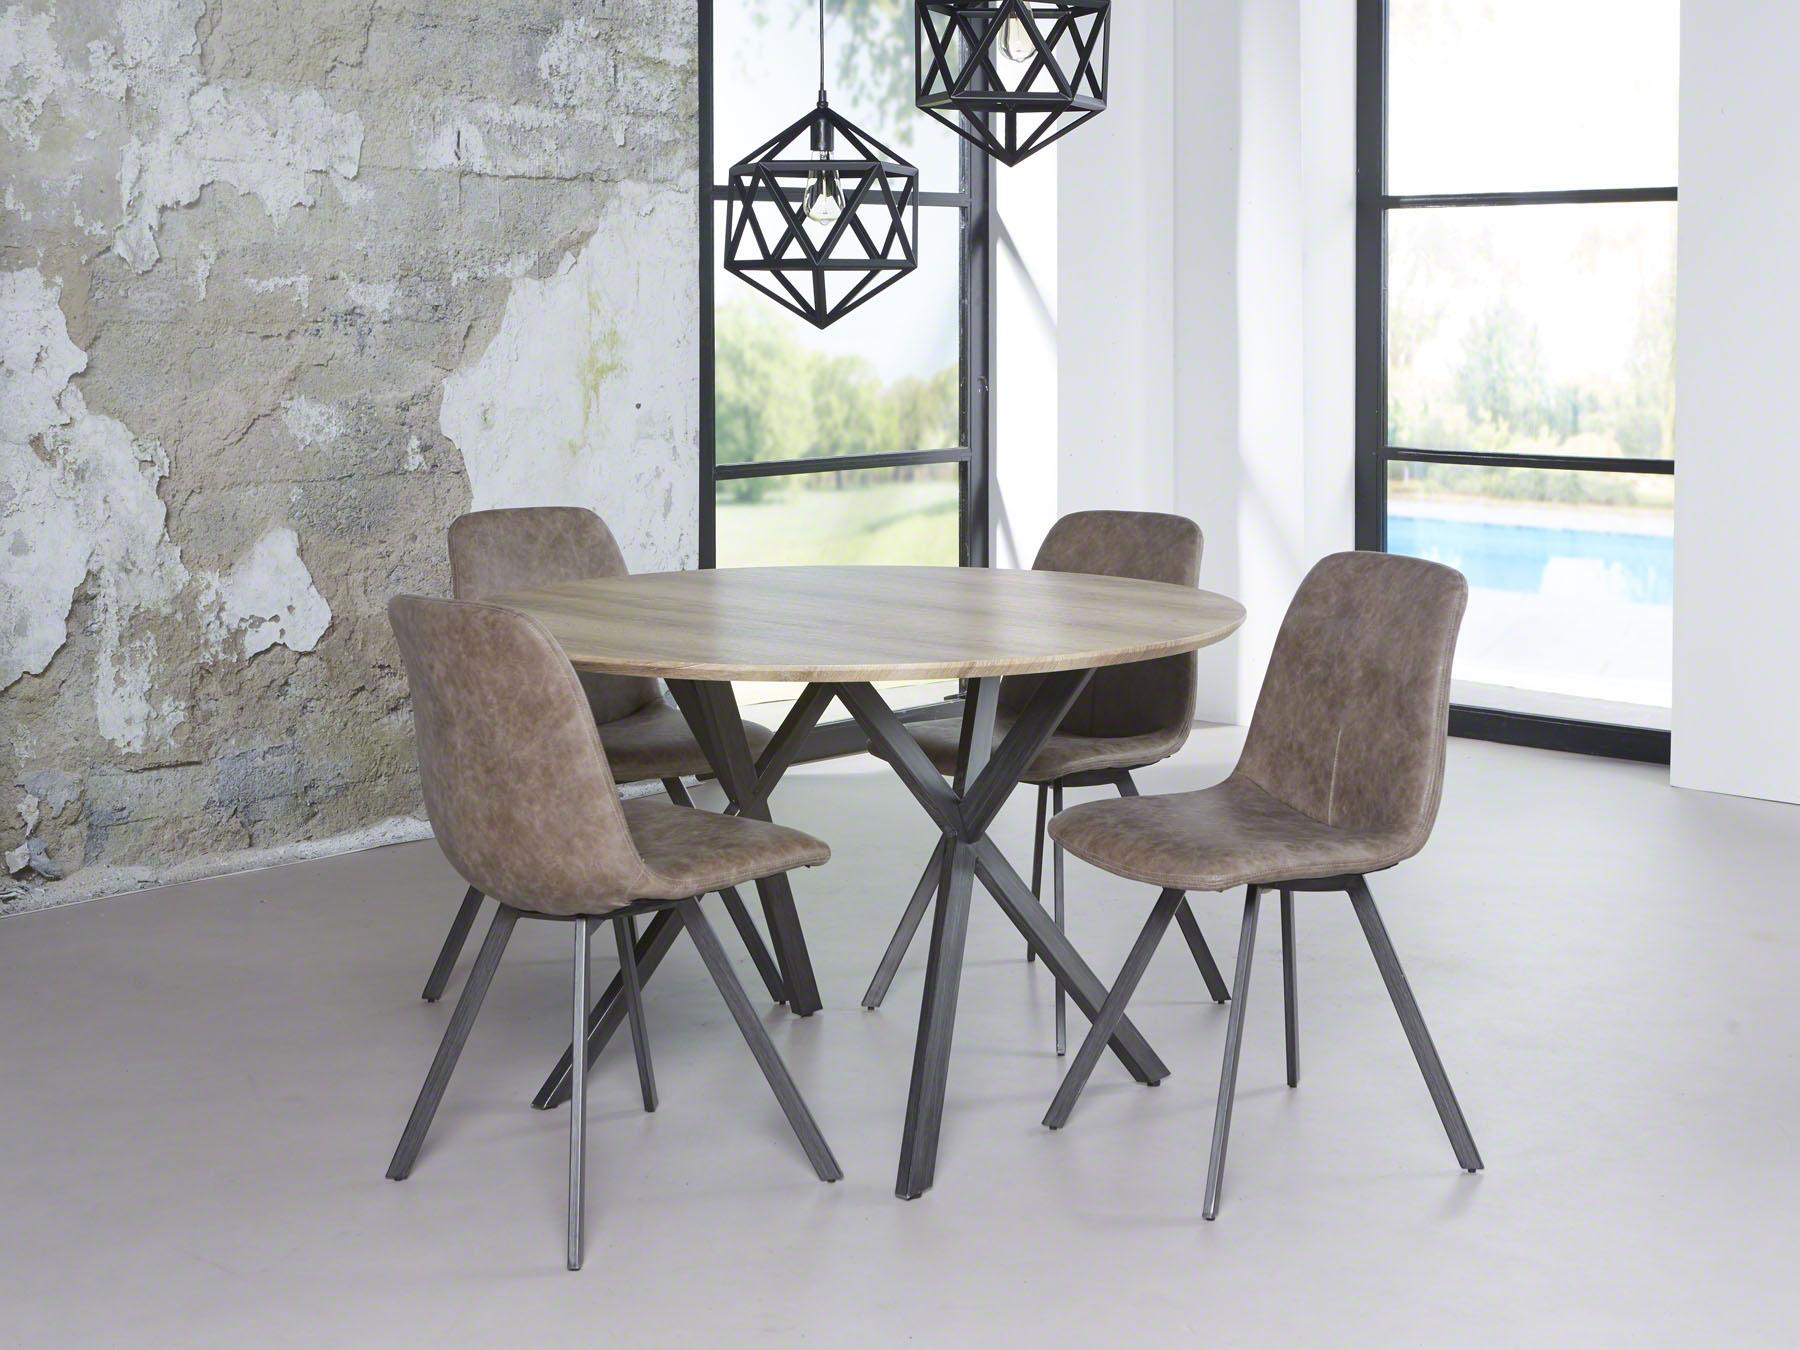 Moderne Ronde Eettafel.Moderne Ronde Tafel Kopen Meubeldeals Nl